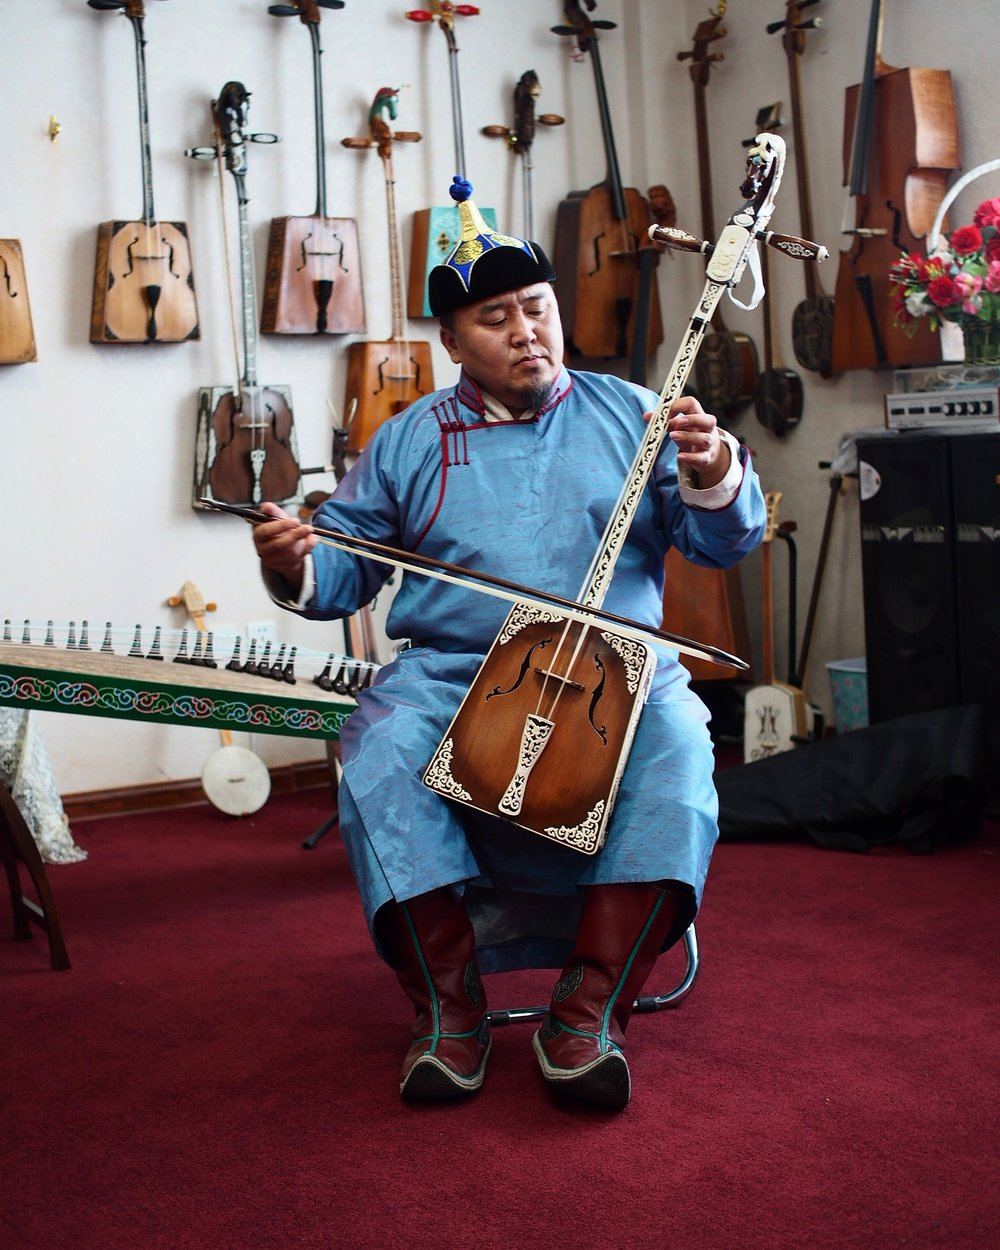 Batzorig playing the morin khuur.